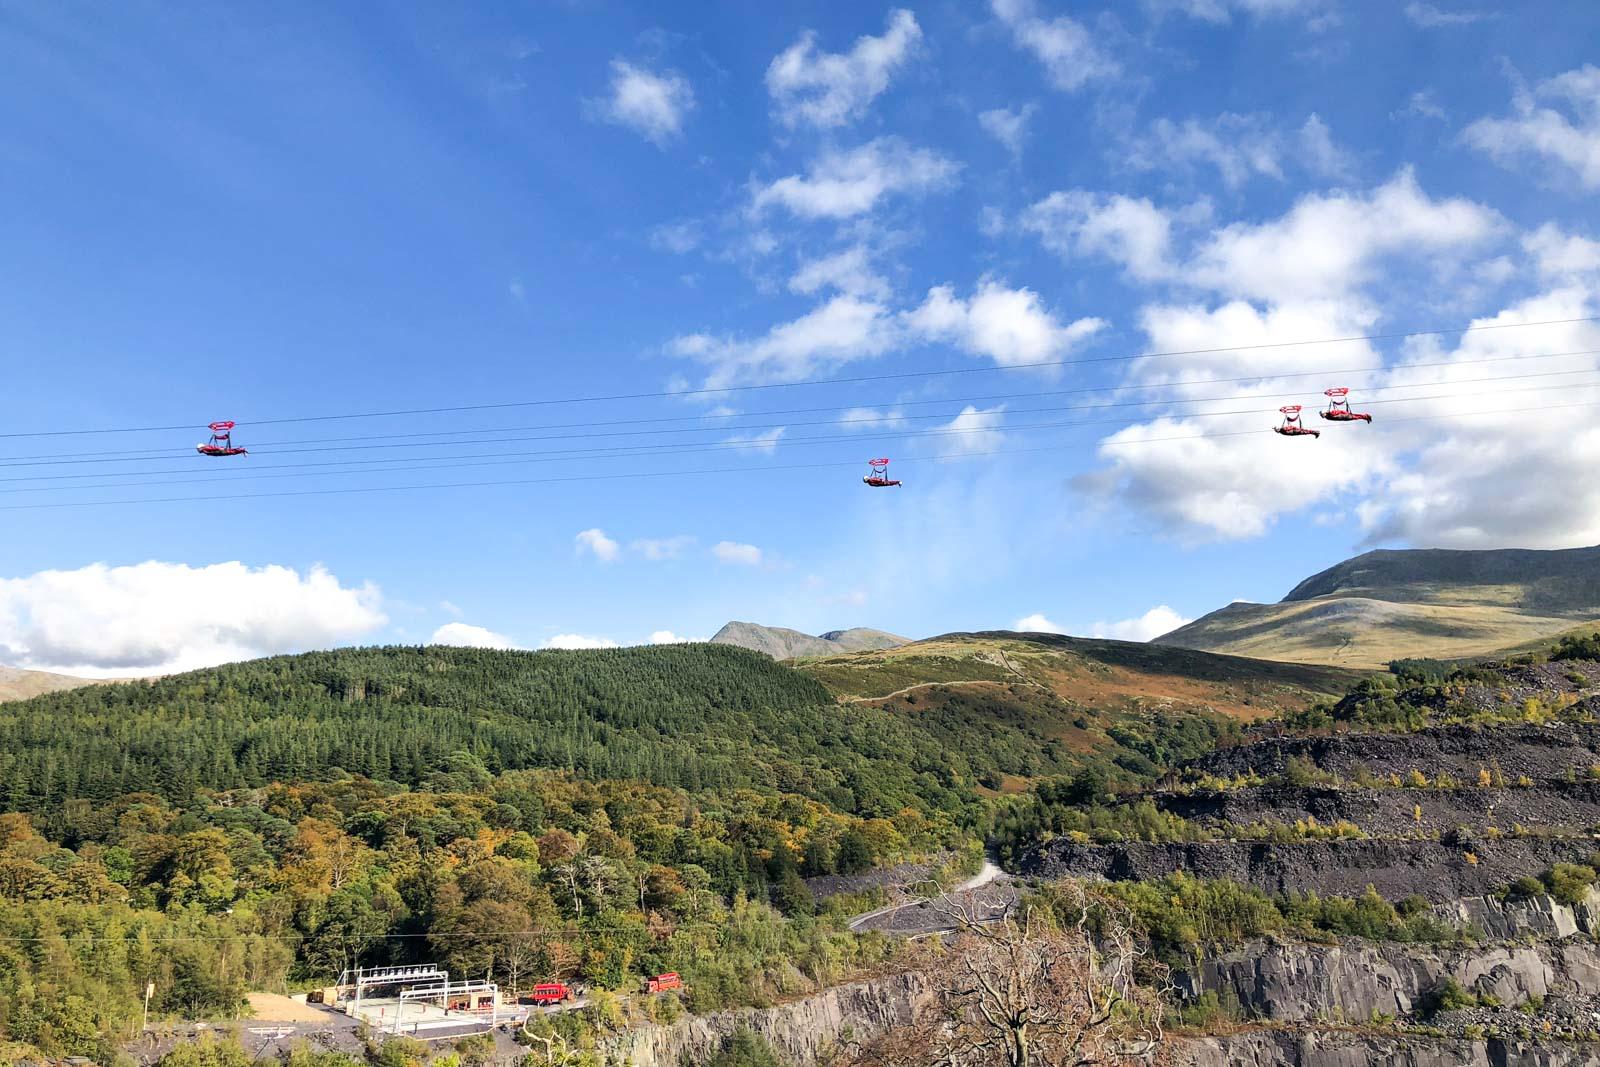 Velocity 2 Zipline in Wales